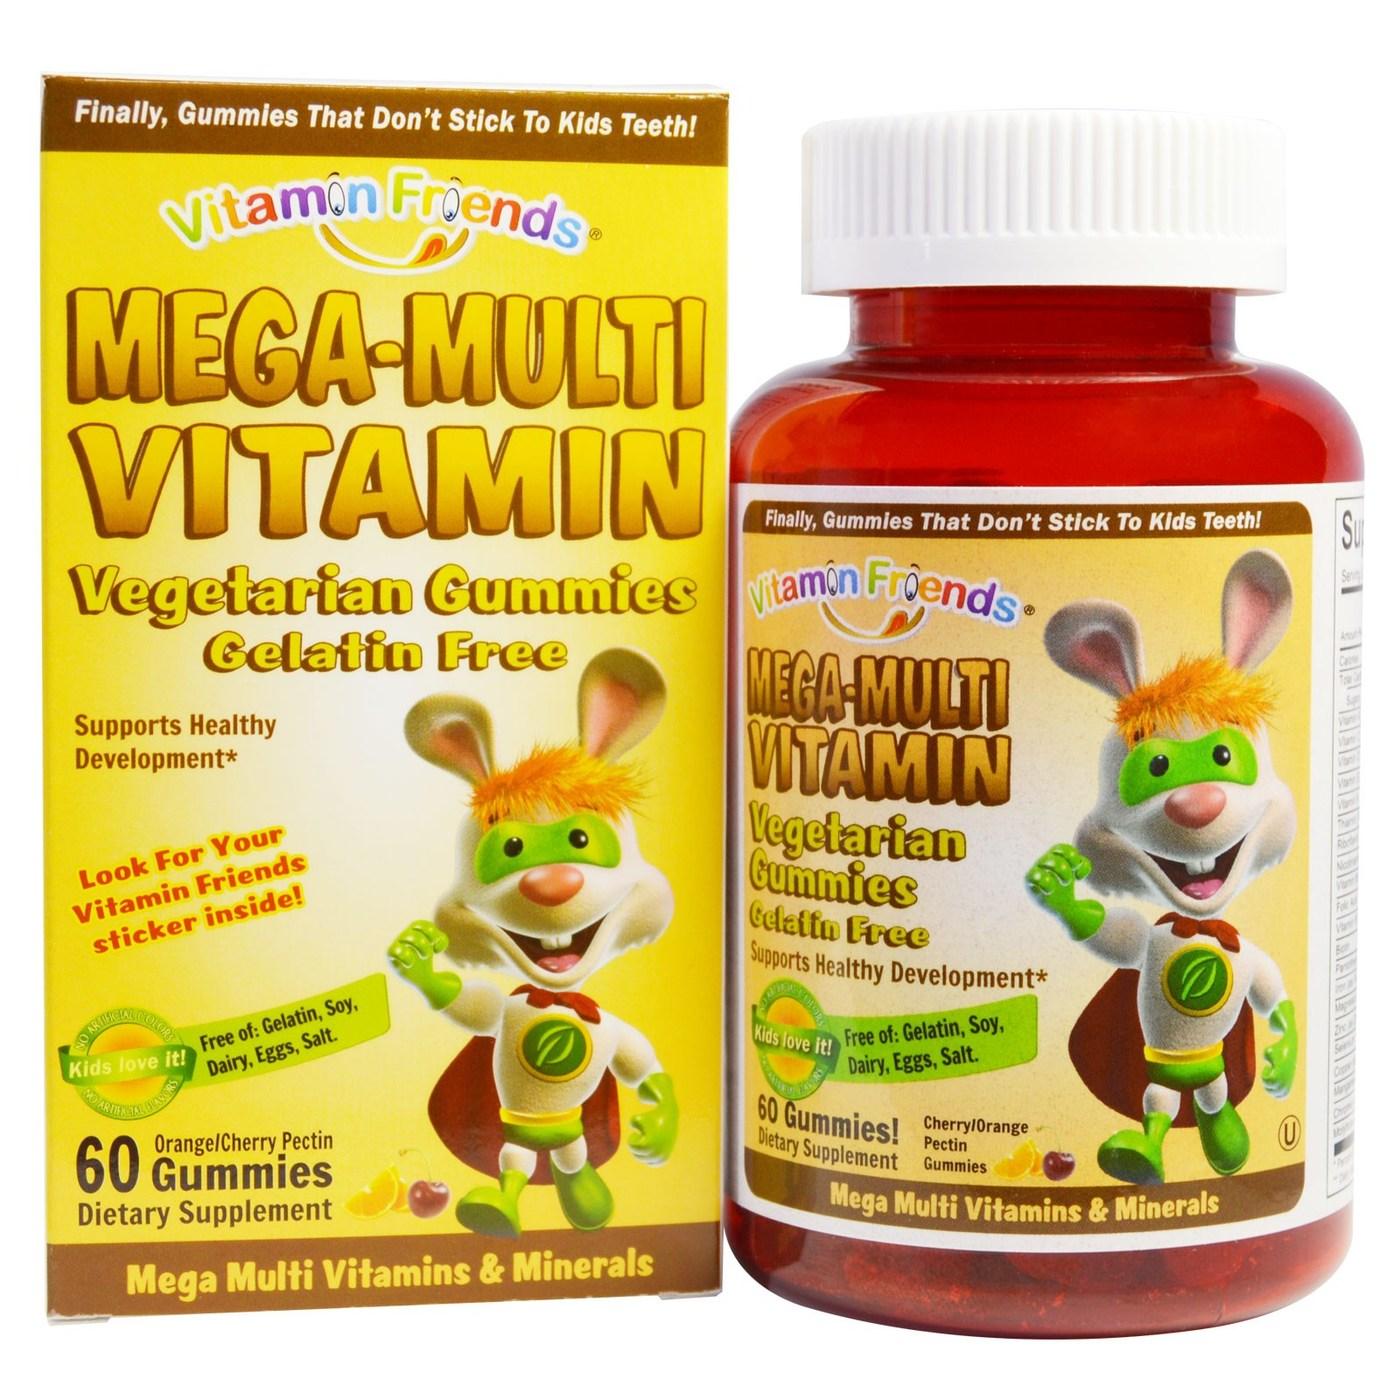 Vitamin Friends Mega-Multi Vitamin - 60 Pectin Gummies